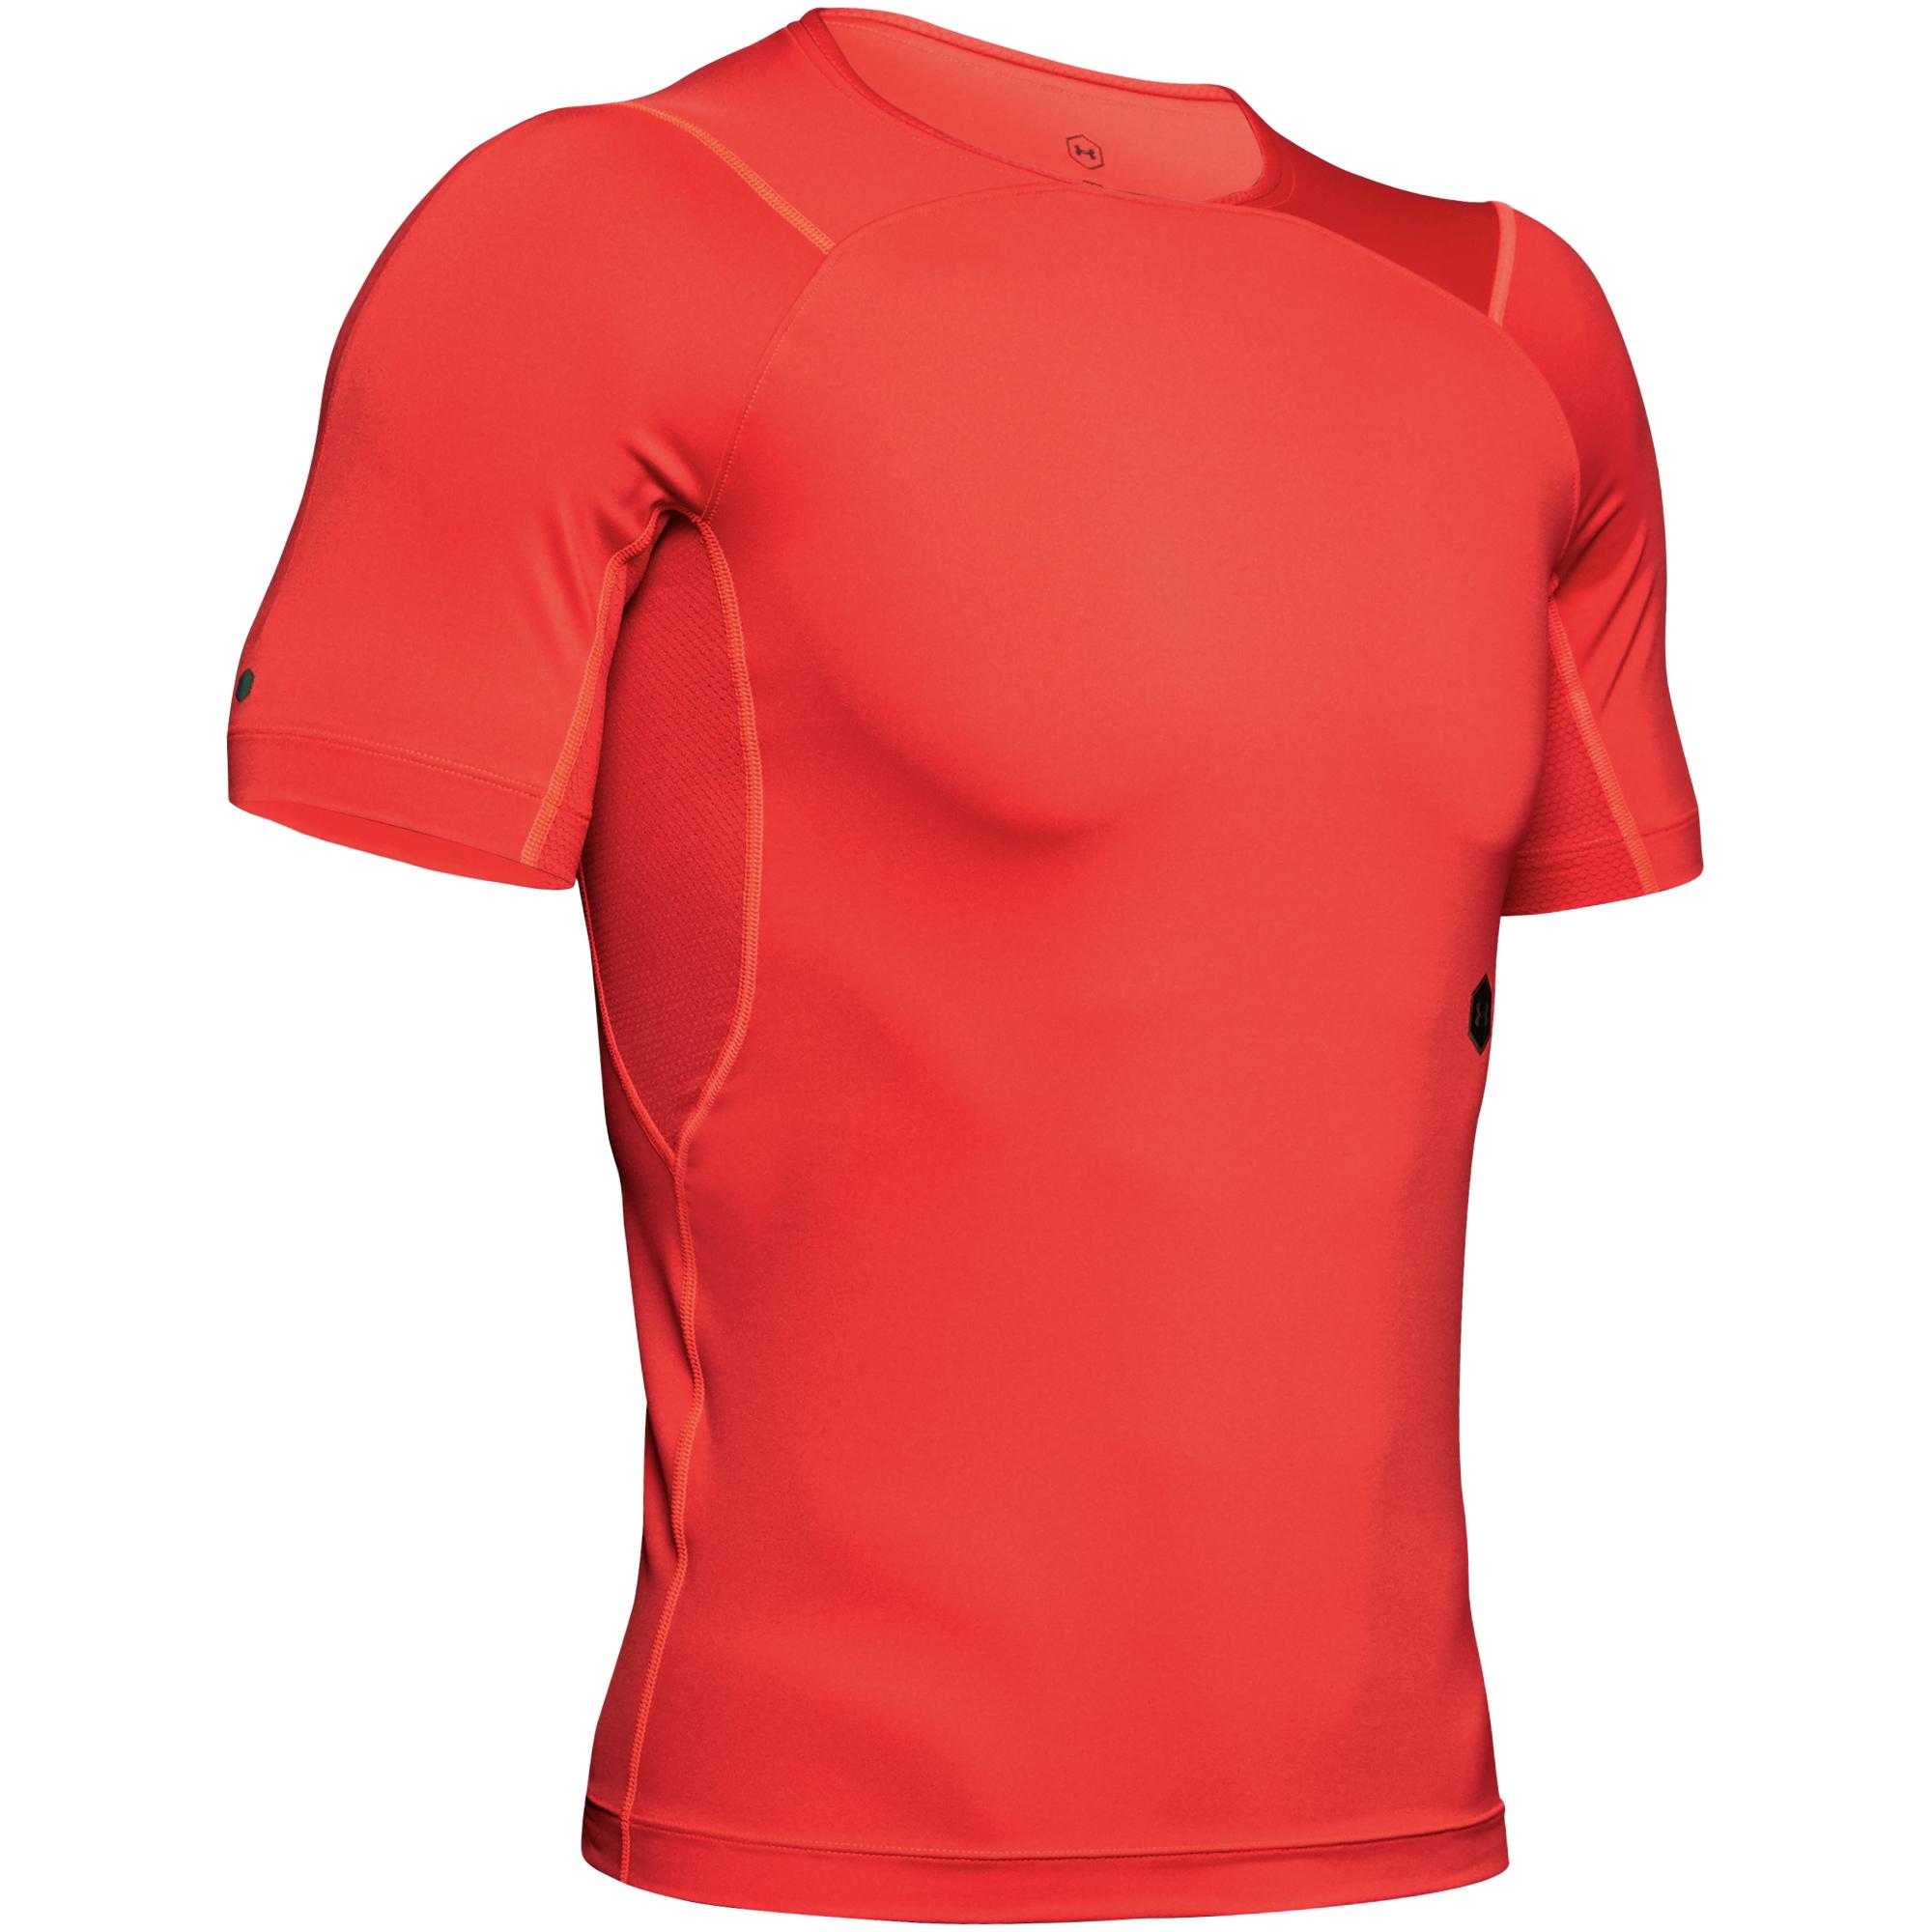 Kompresní tričko Under Armour Hg Rush Compression Ss-Red